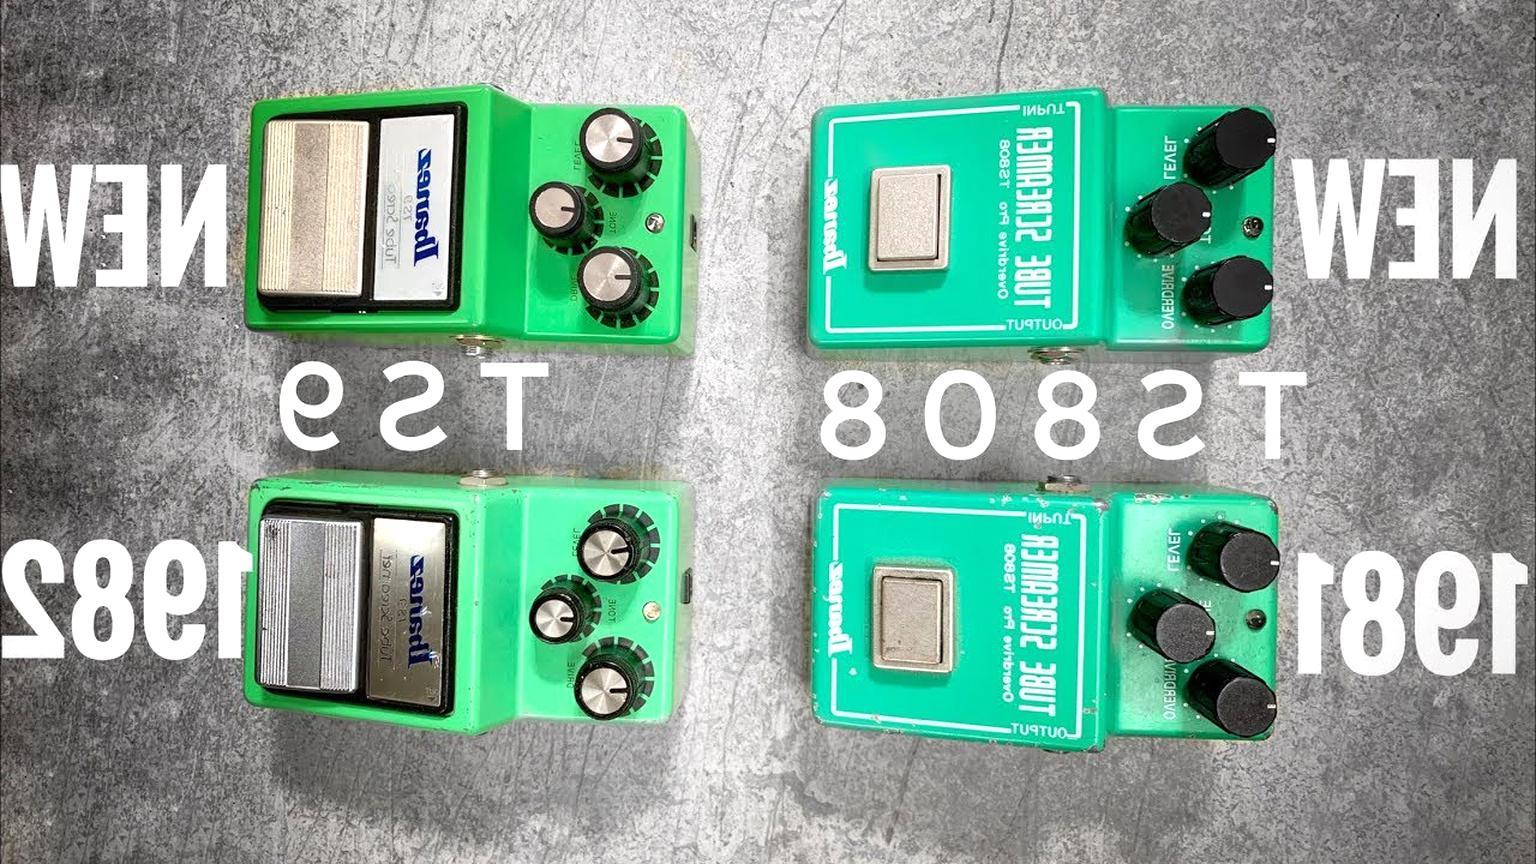 ibanez tube screamer ts 808 1982 gebraucht kaufen